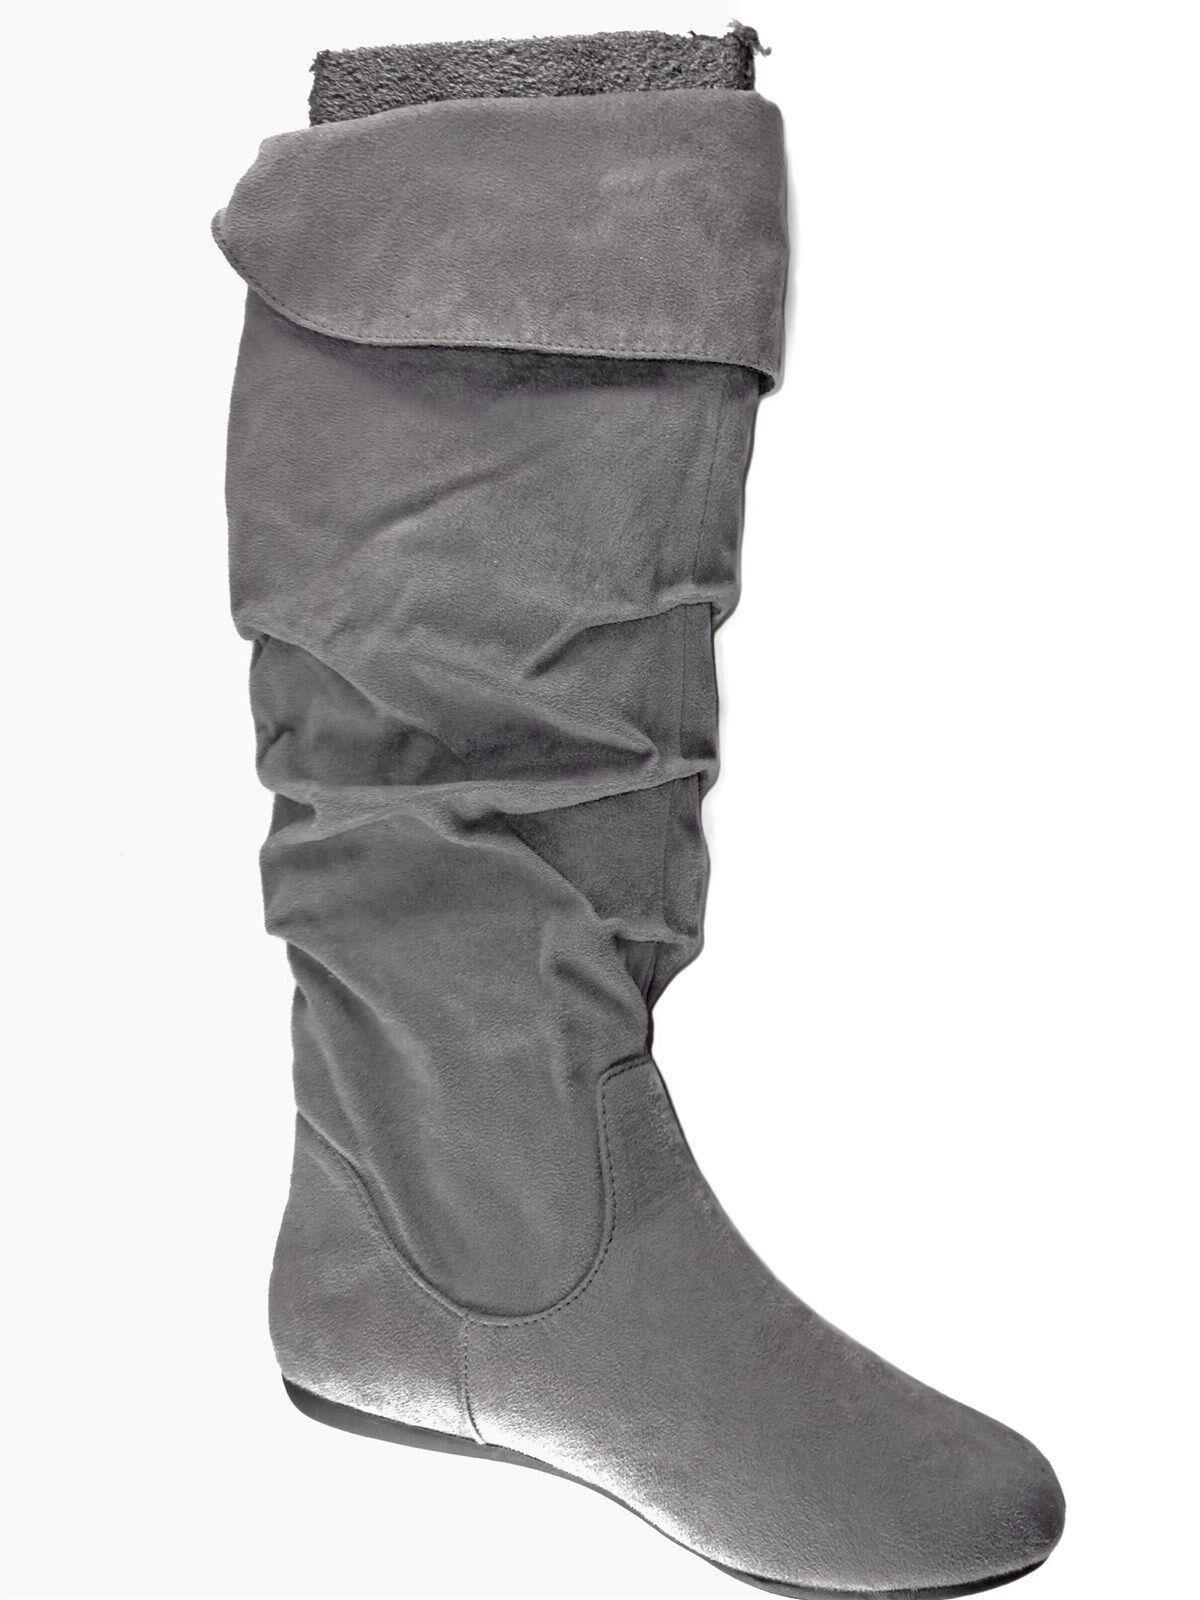 Sito ufficiale Rampage Donna  Bridge Fashion Flat Knee-High Knee-High Knee-High stivali grigio Faux Suede Sz 6 M  marca